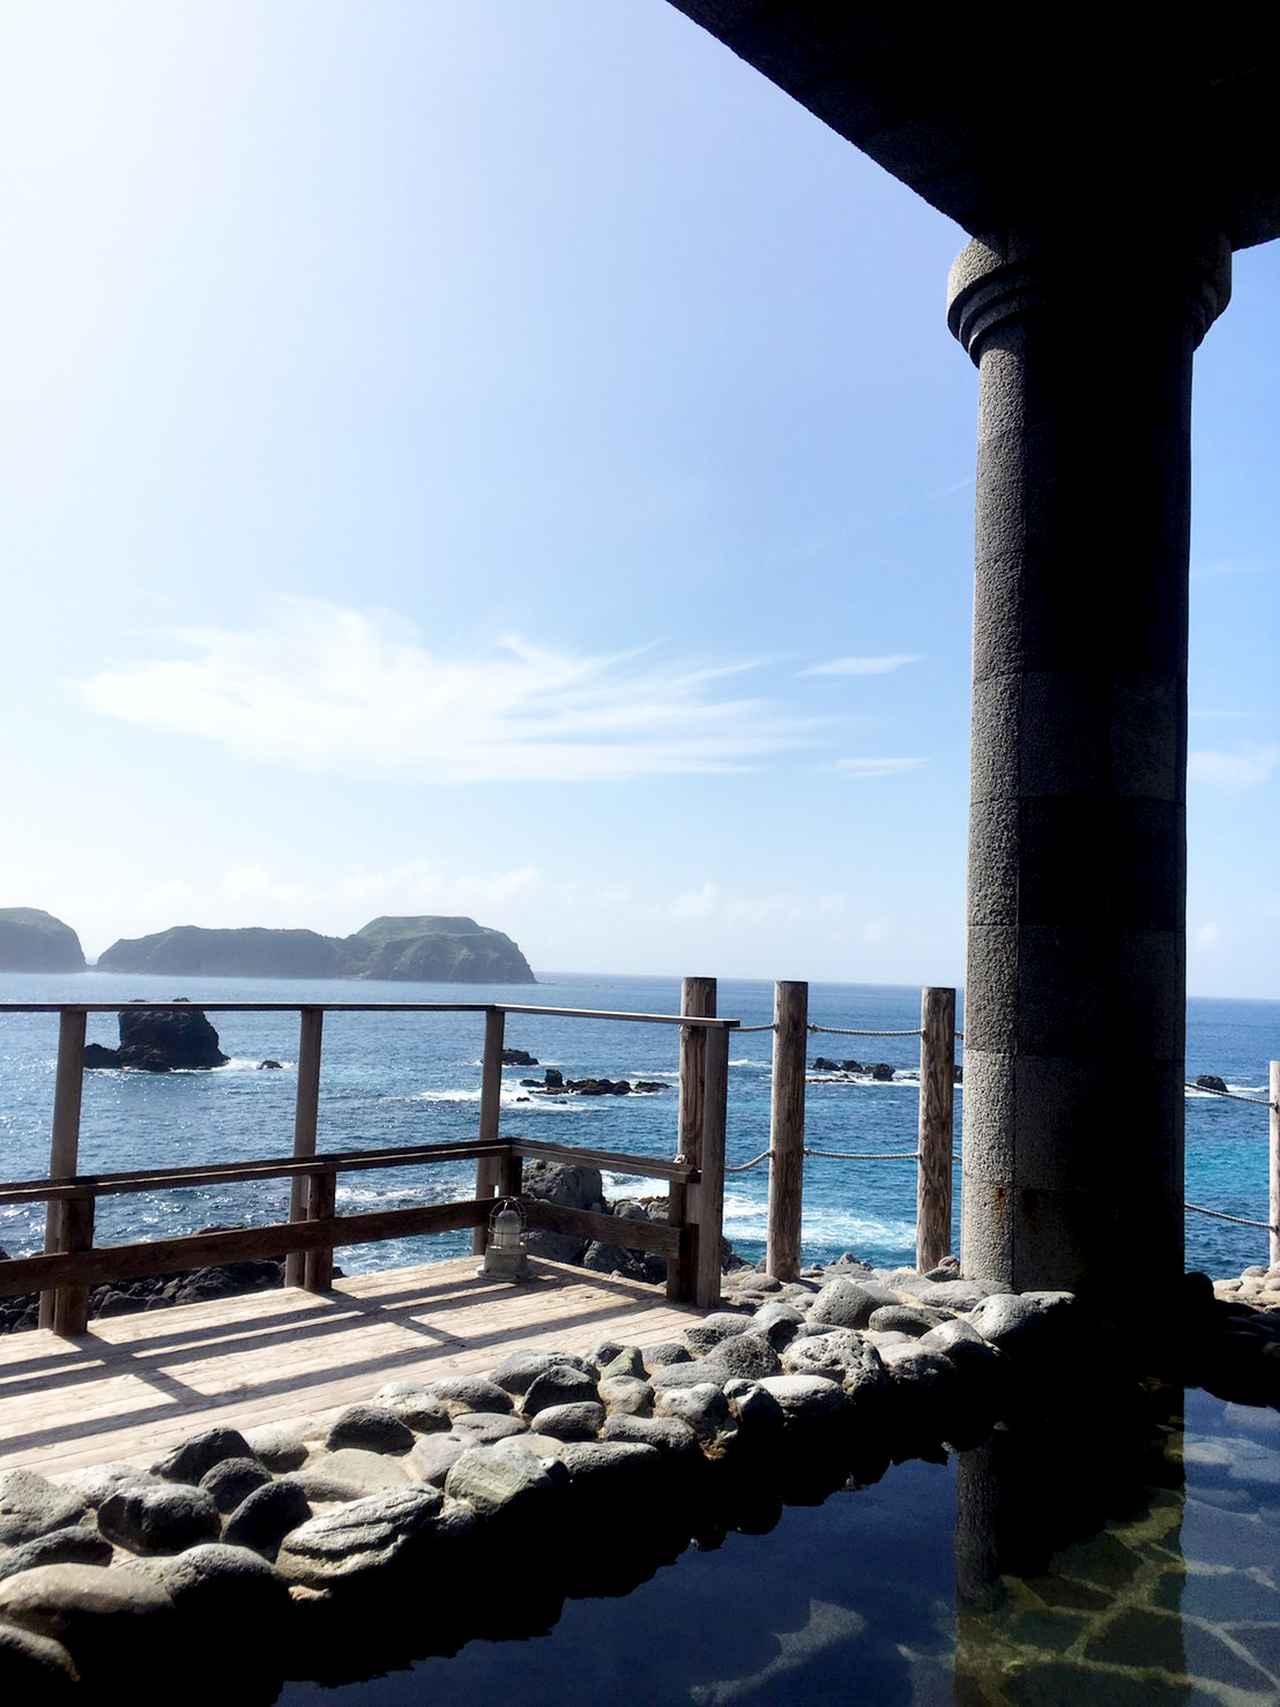 Images : 5番目の画像 - 湯の浜露天温泉 - webオートバイ